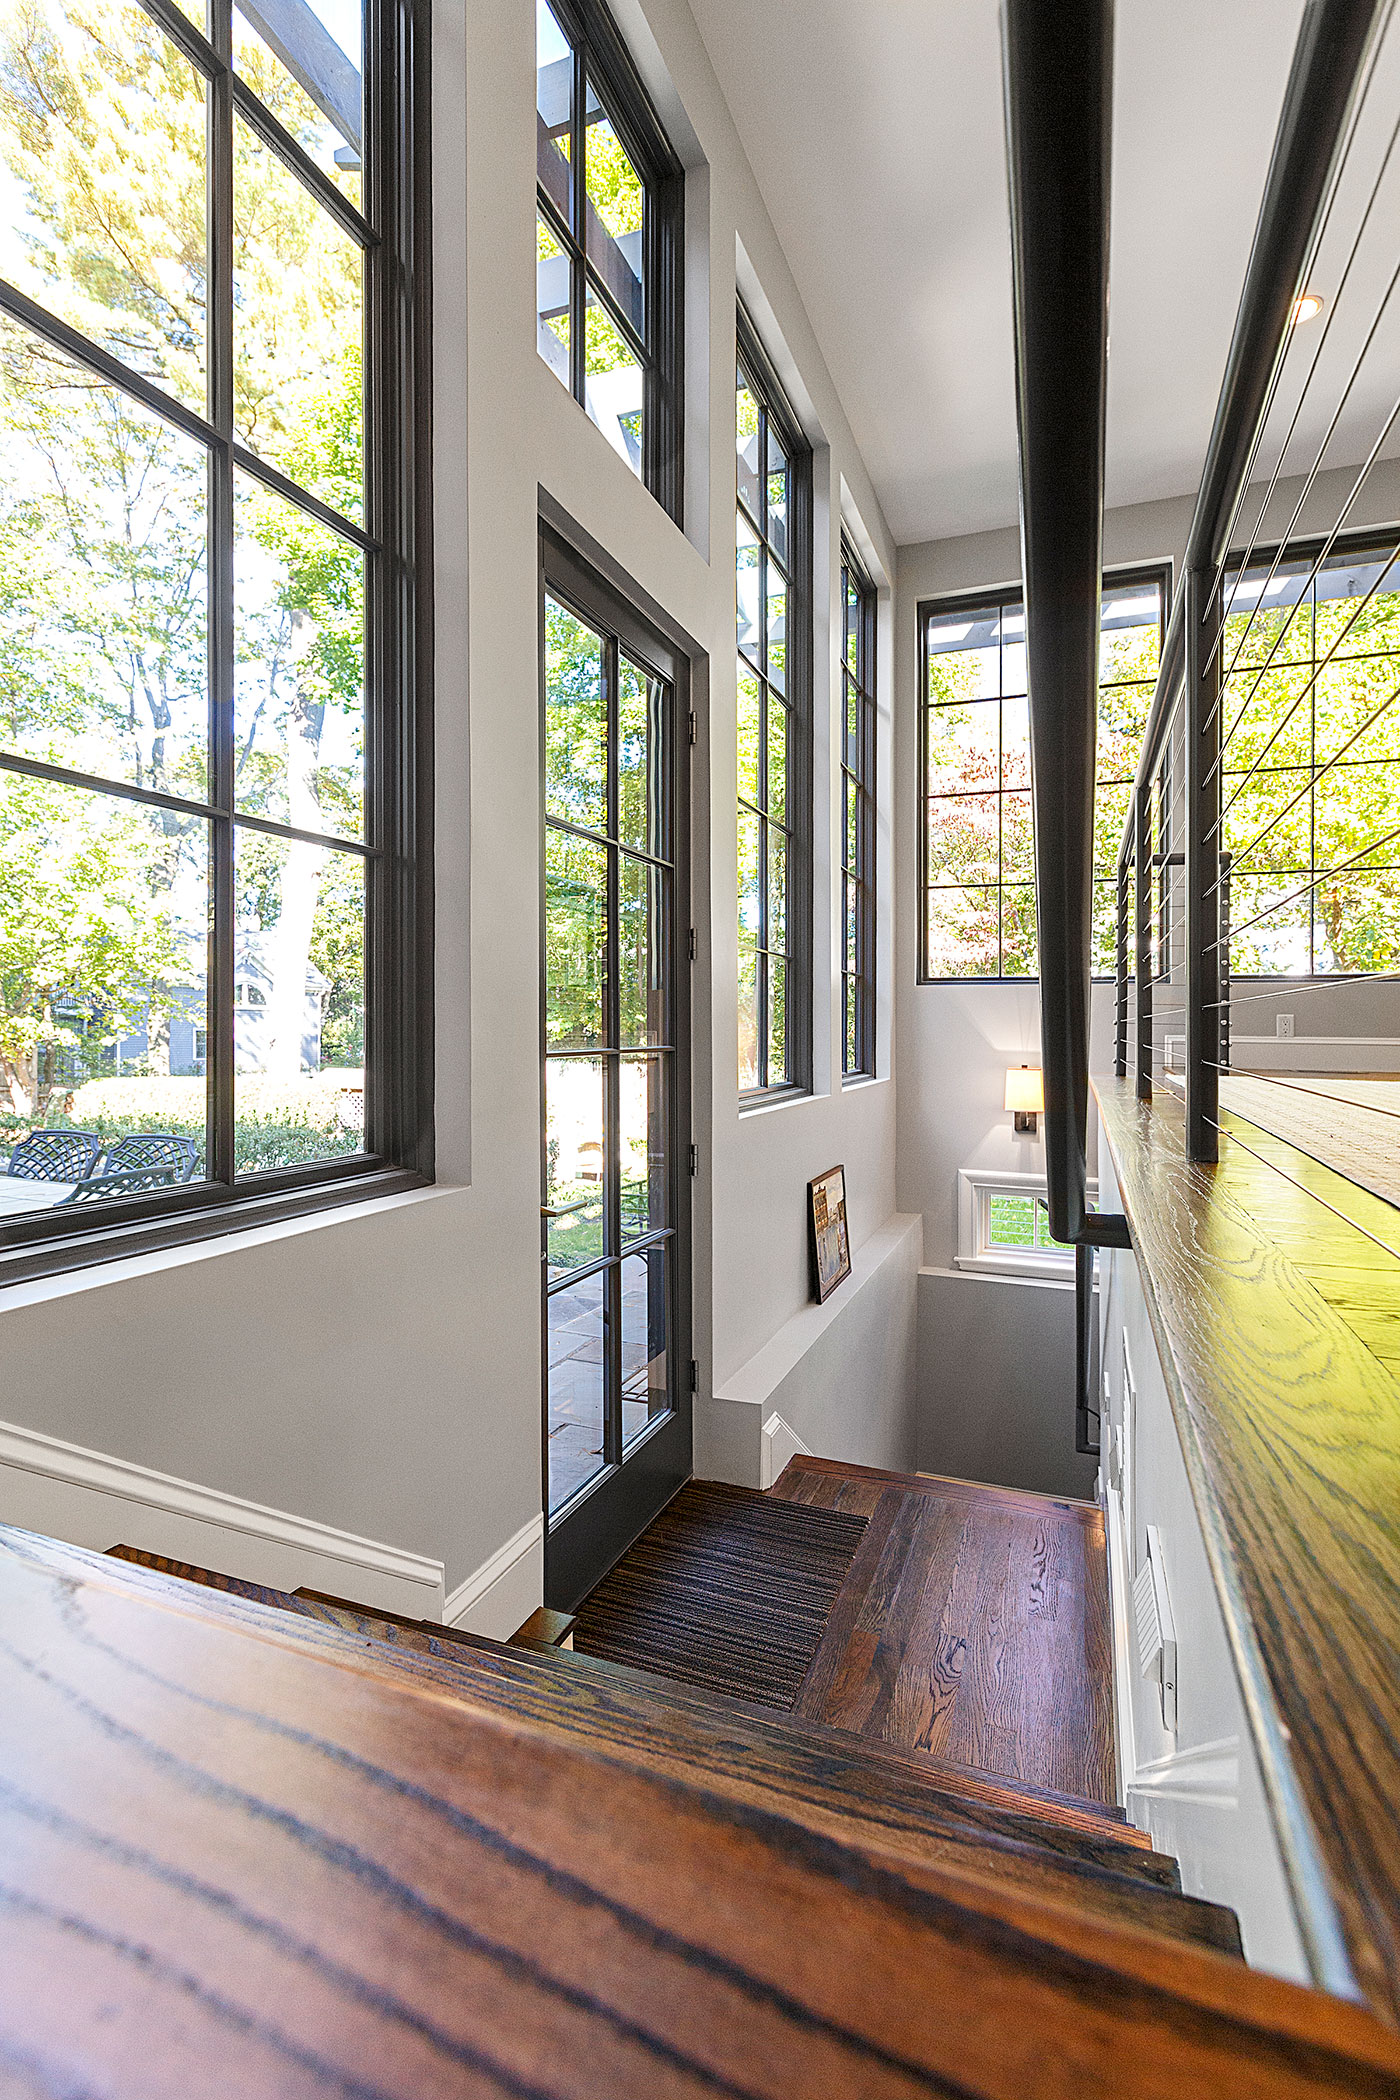 Peter Sachs Architect Boston area custom addition with Pella Windows